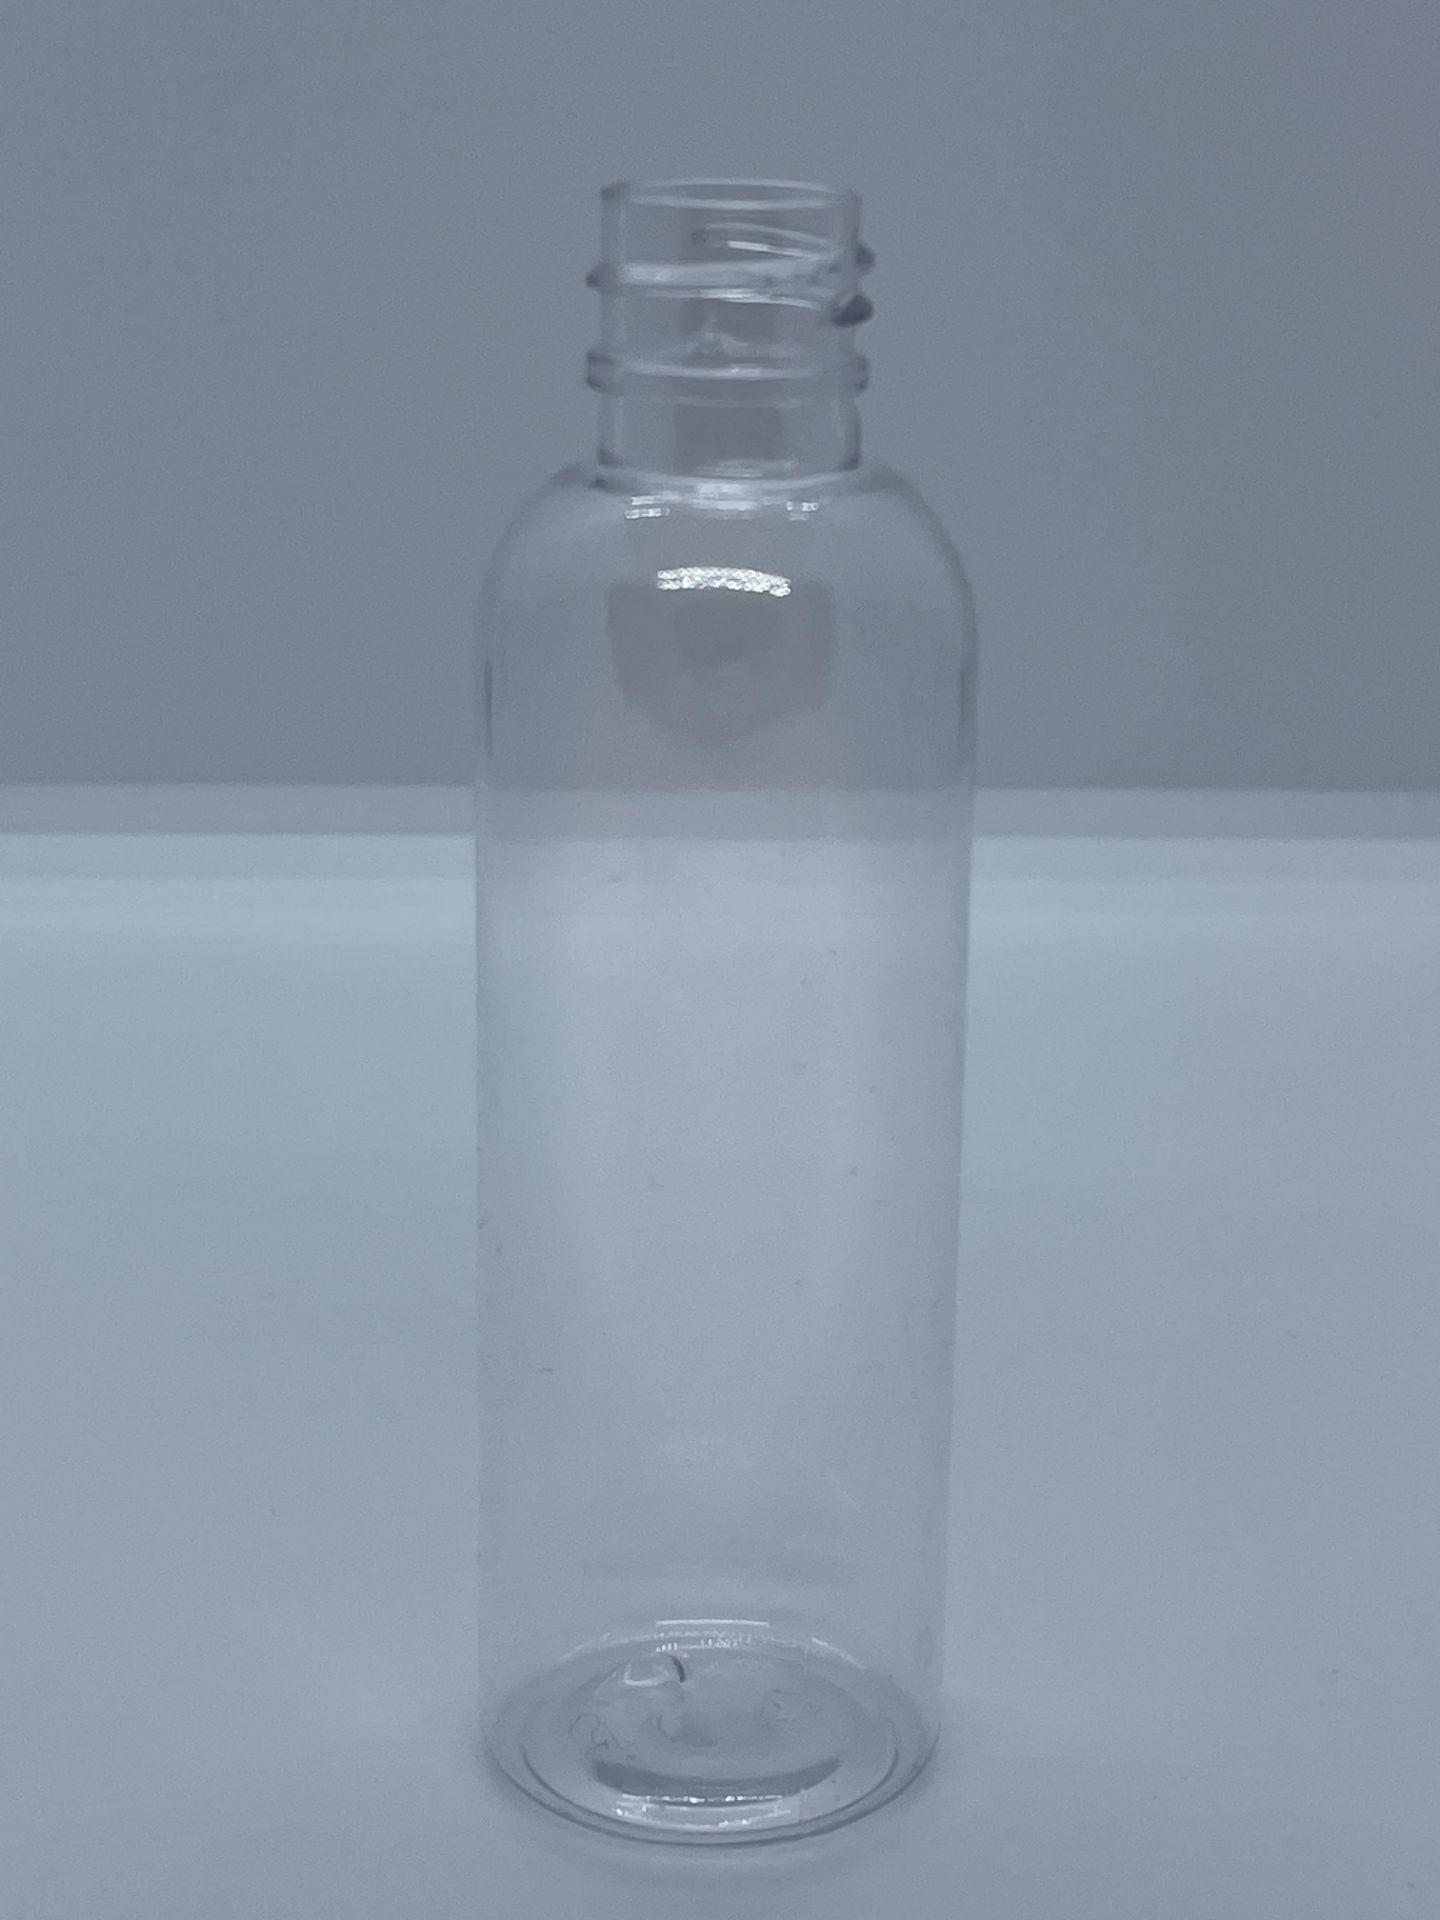 "99,500 - Clear Plastic Bullet 2 oz Empty Bottles, 18-410 Threading Neck, 4.25"" Tall 1.25"" Diameter - Image 3 of 5"